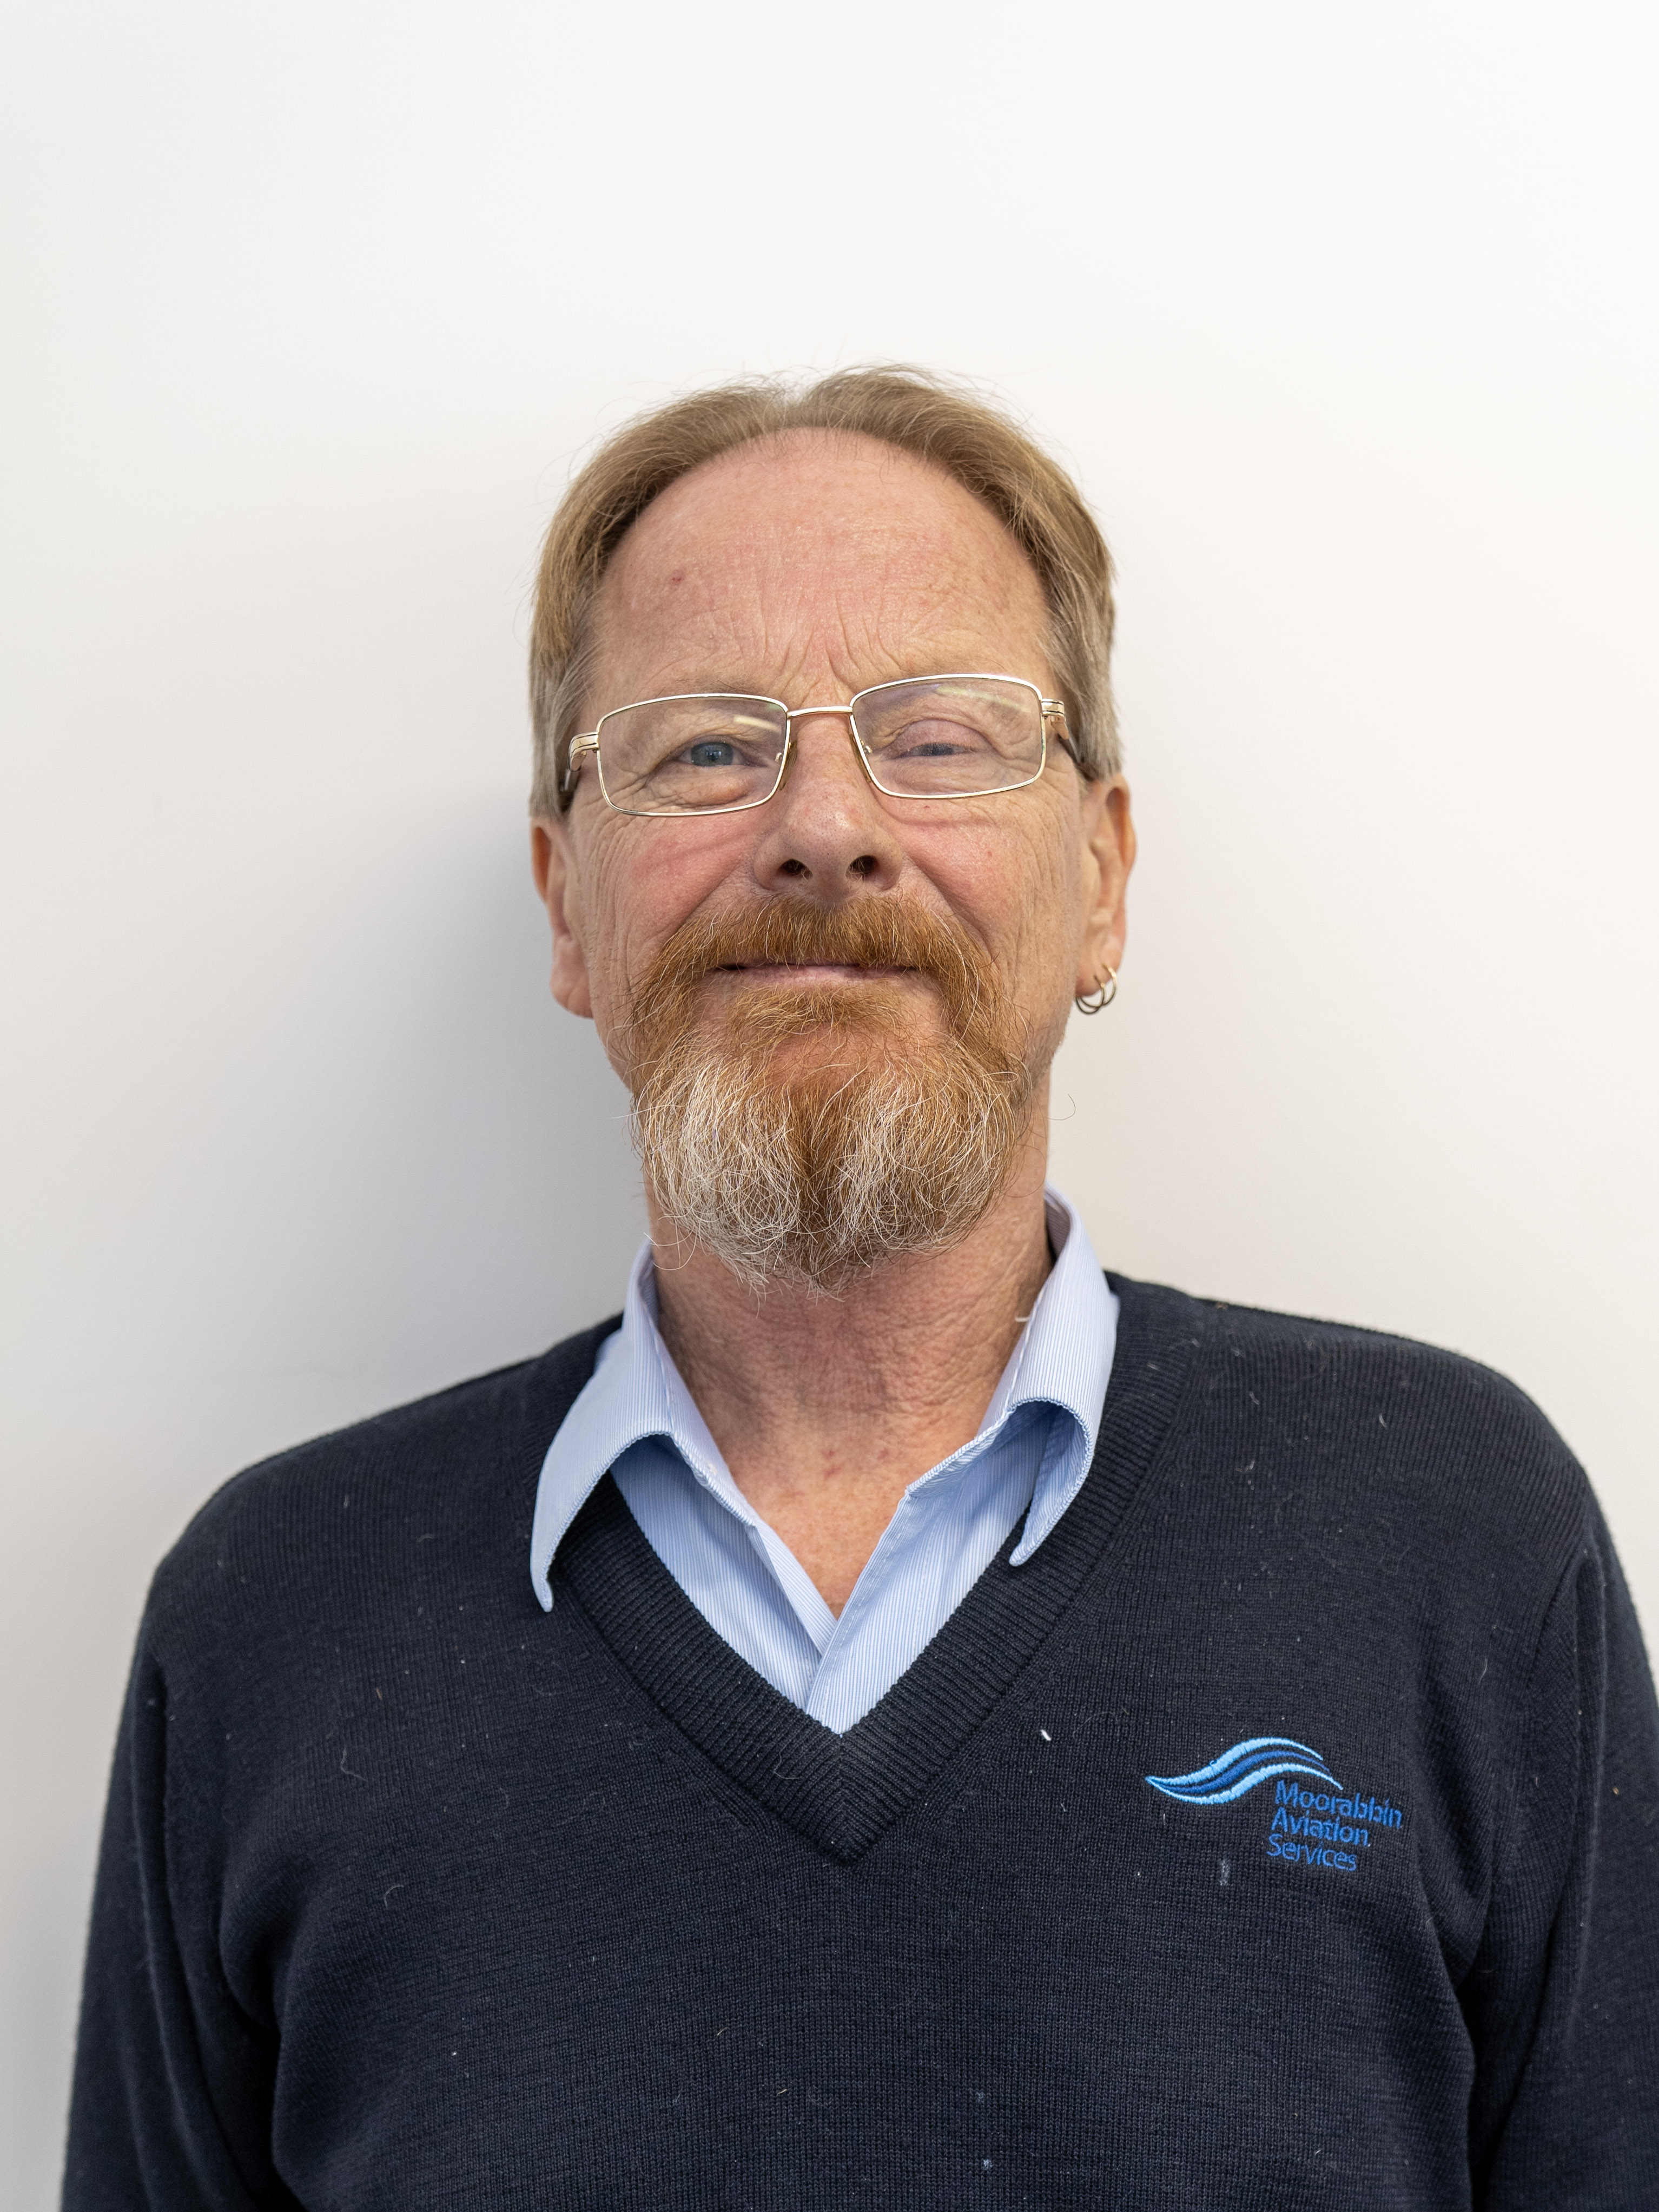 Alan Neilsen